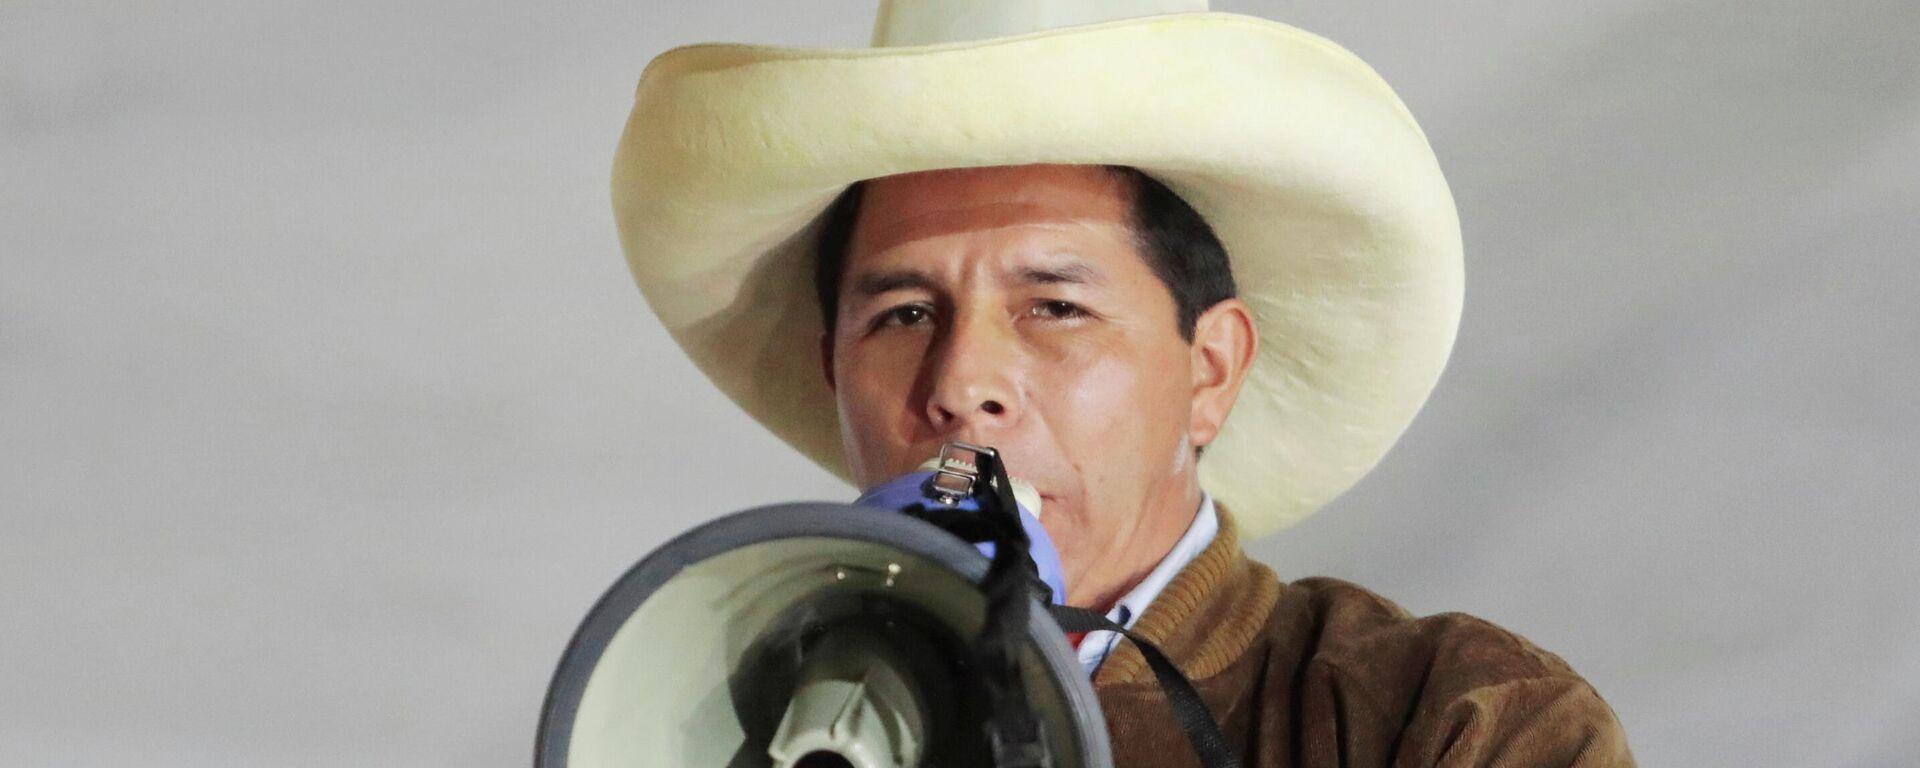 Pedro Castillo, candidato a la presidencia de Perú - Sputnik Mundo, 1920, 08.06.2021